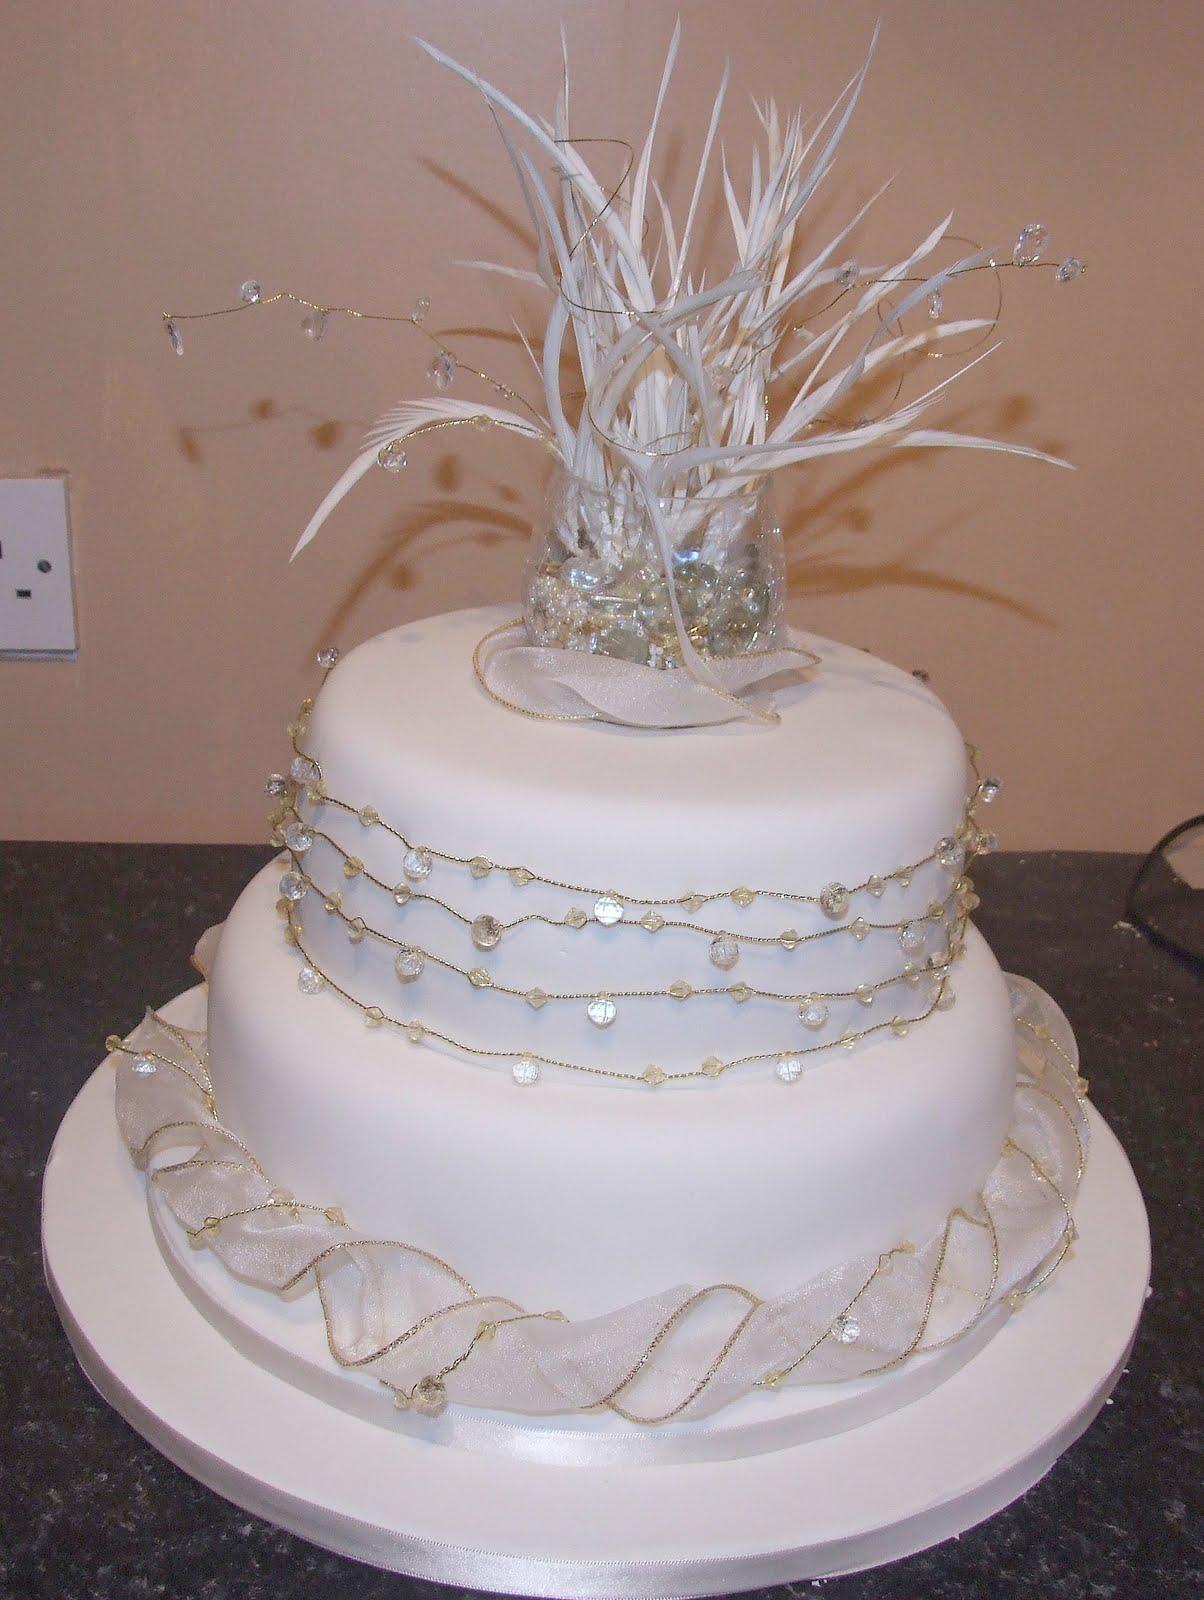 Special Occasion Cakes Simple contemporary wedding cake